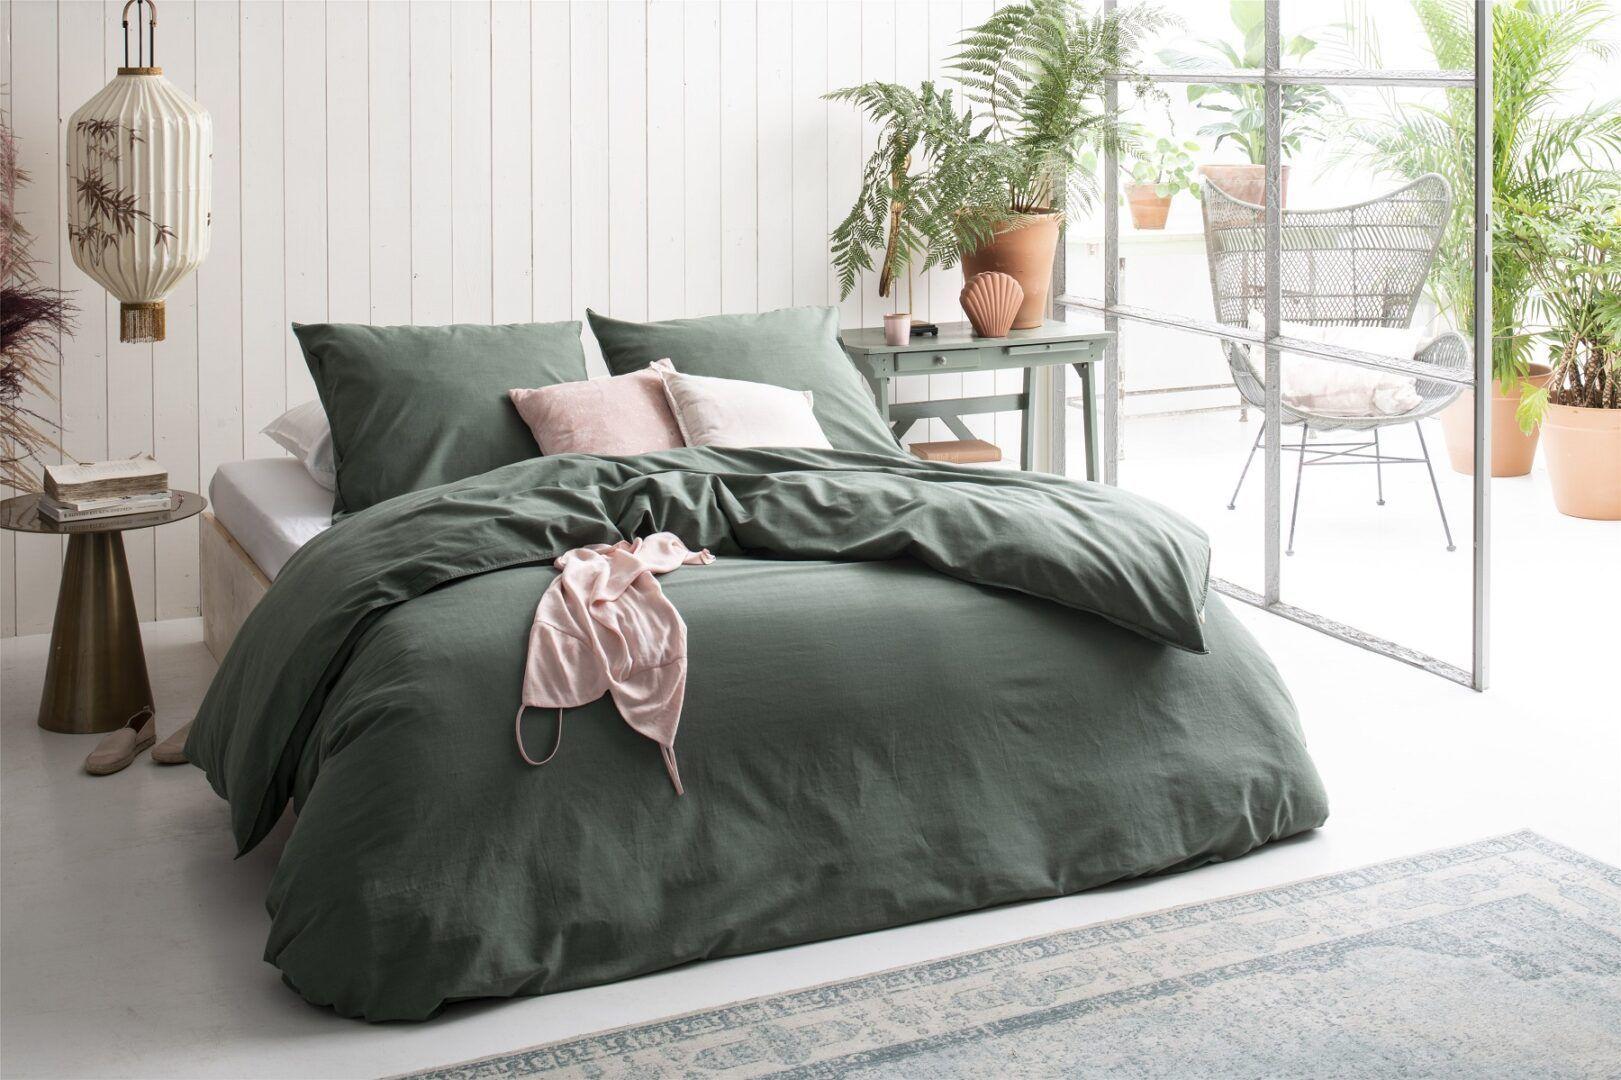 Walra Vintage Cotton dekbedovertrek Donker Groen